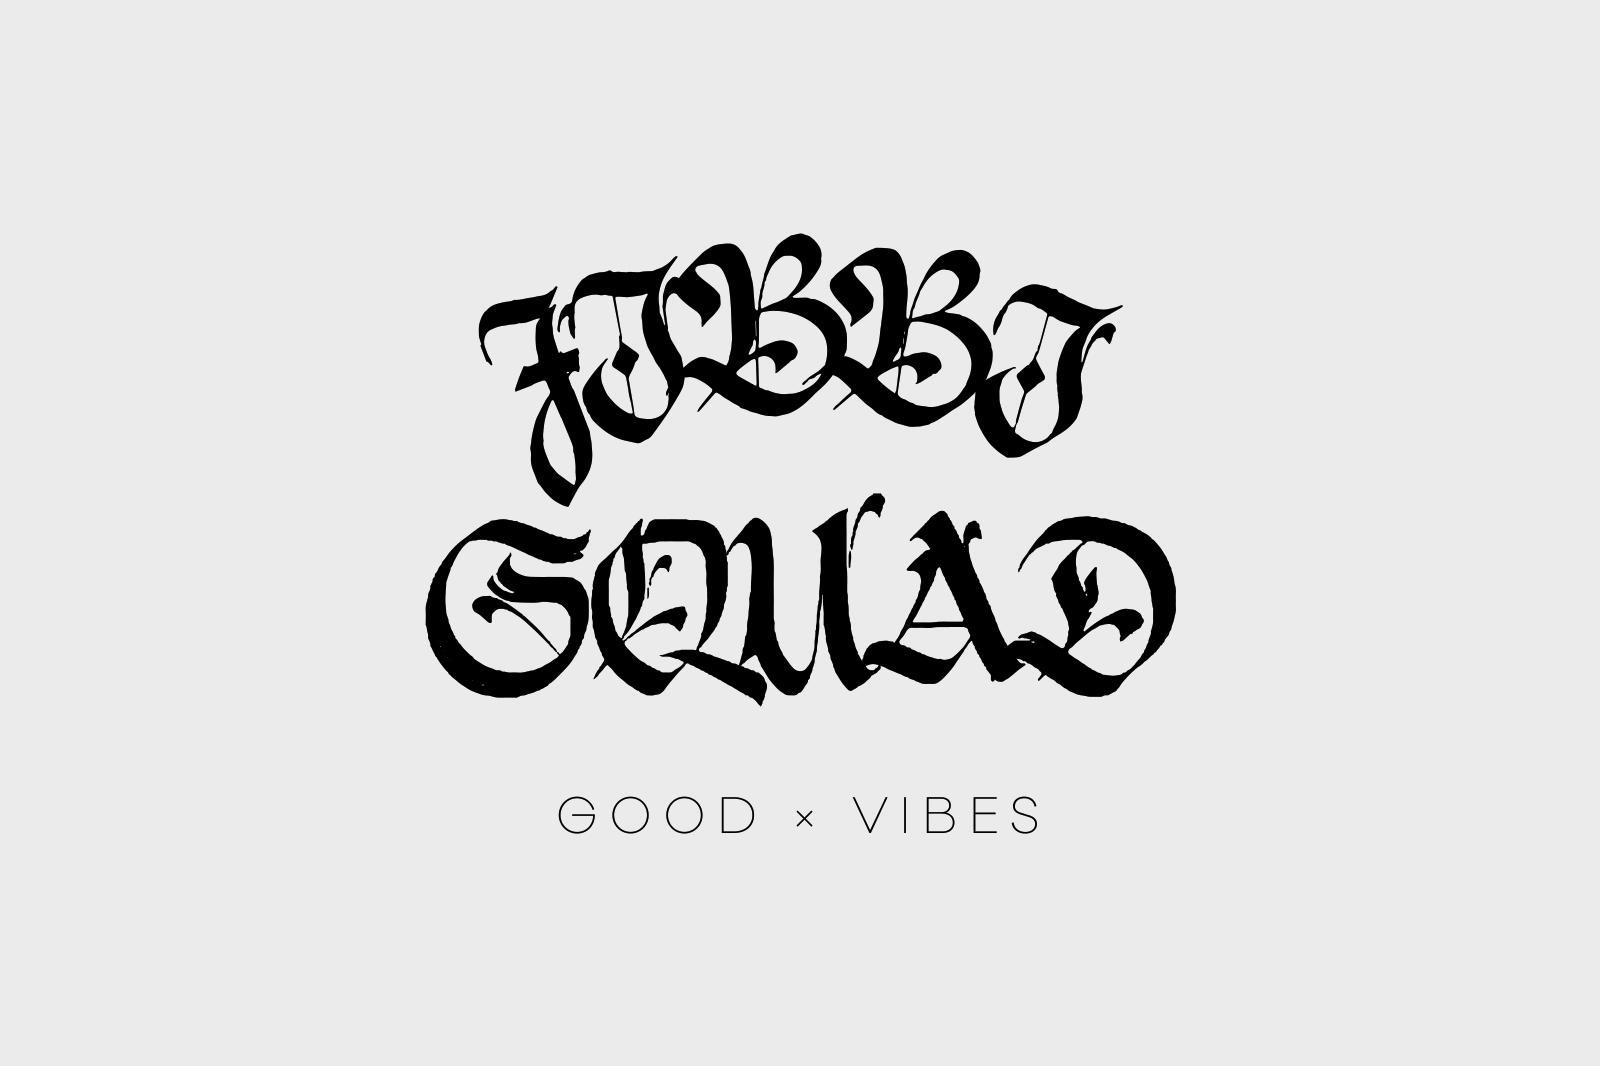 Good-Vibes-Design-4.jpg